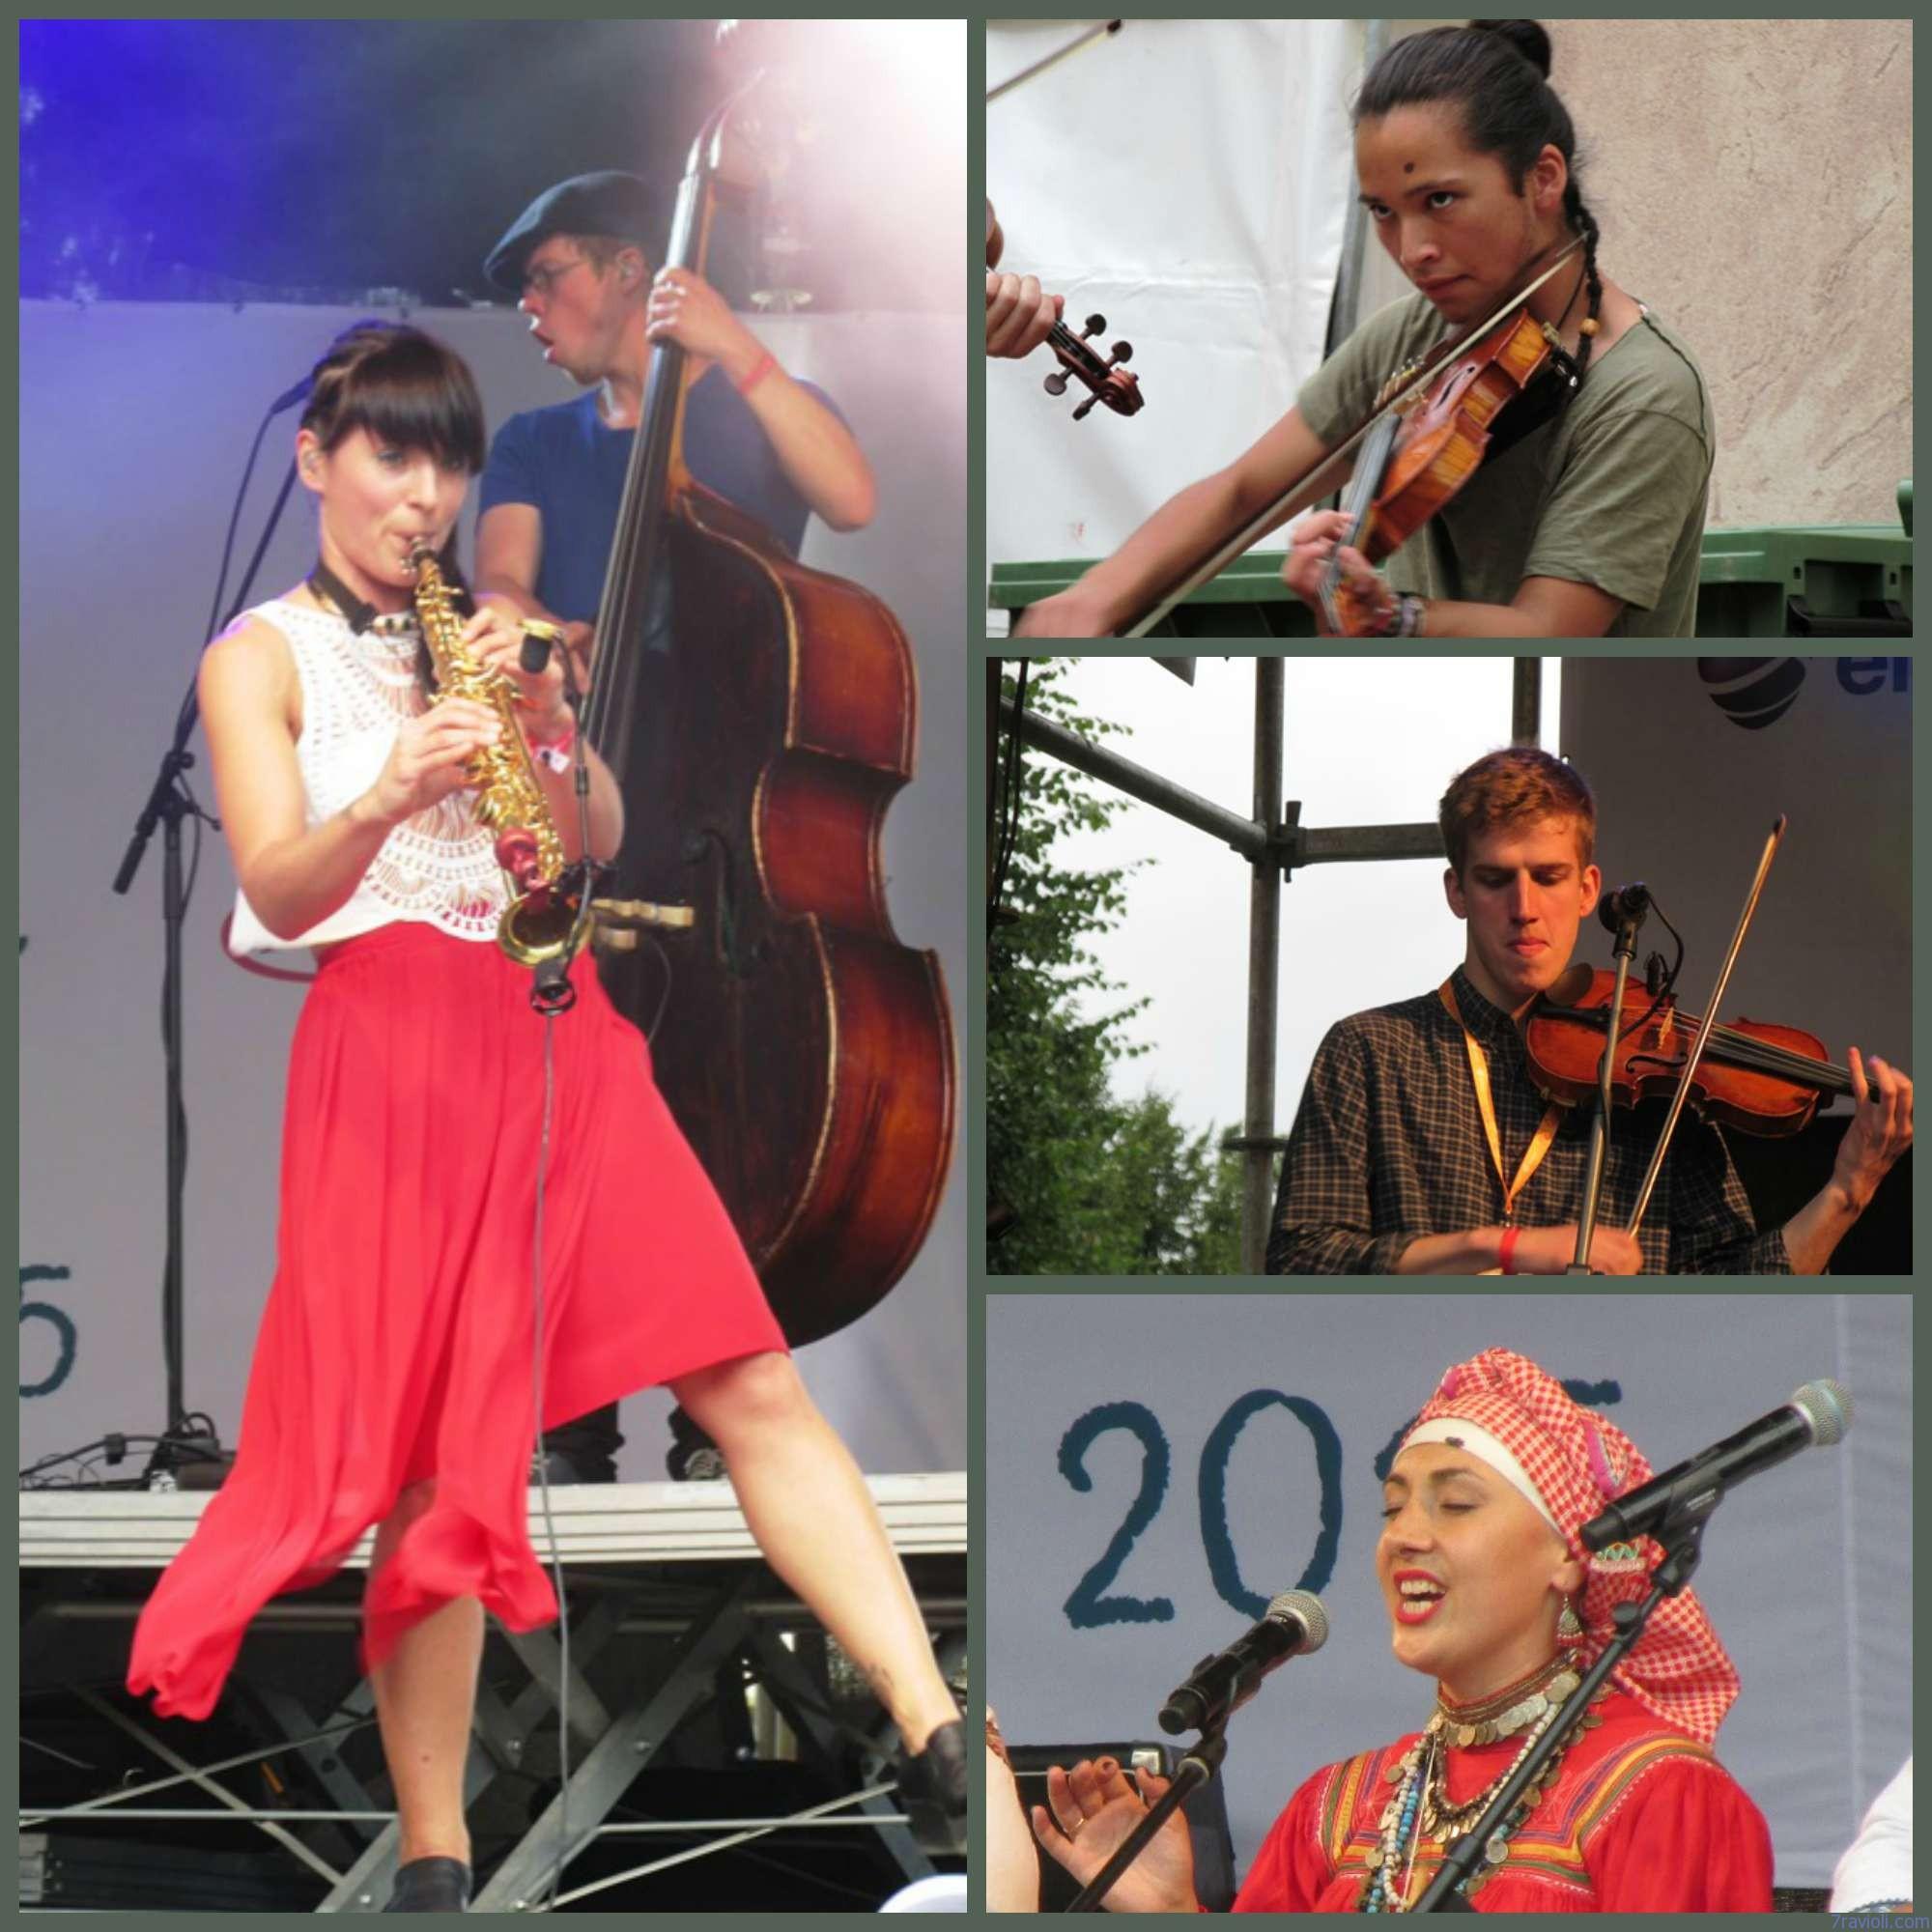 Viljandi Folk music